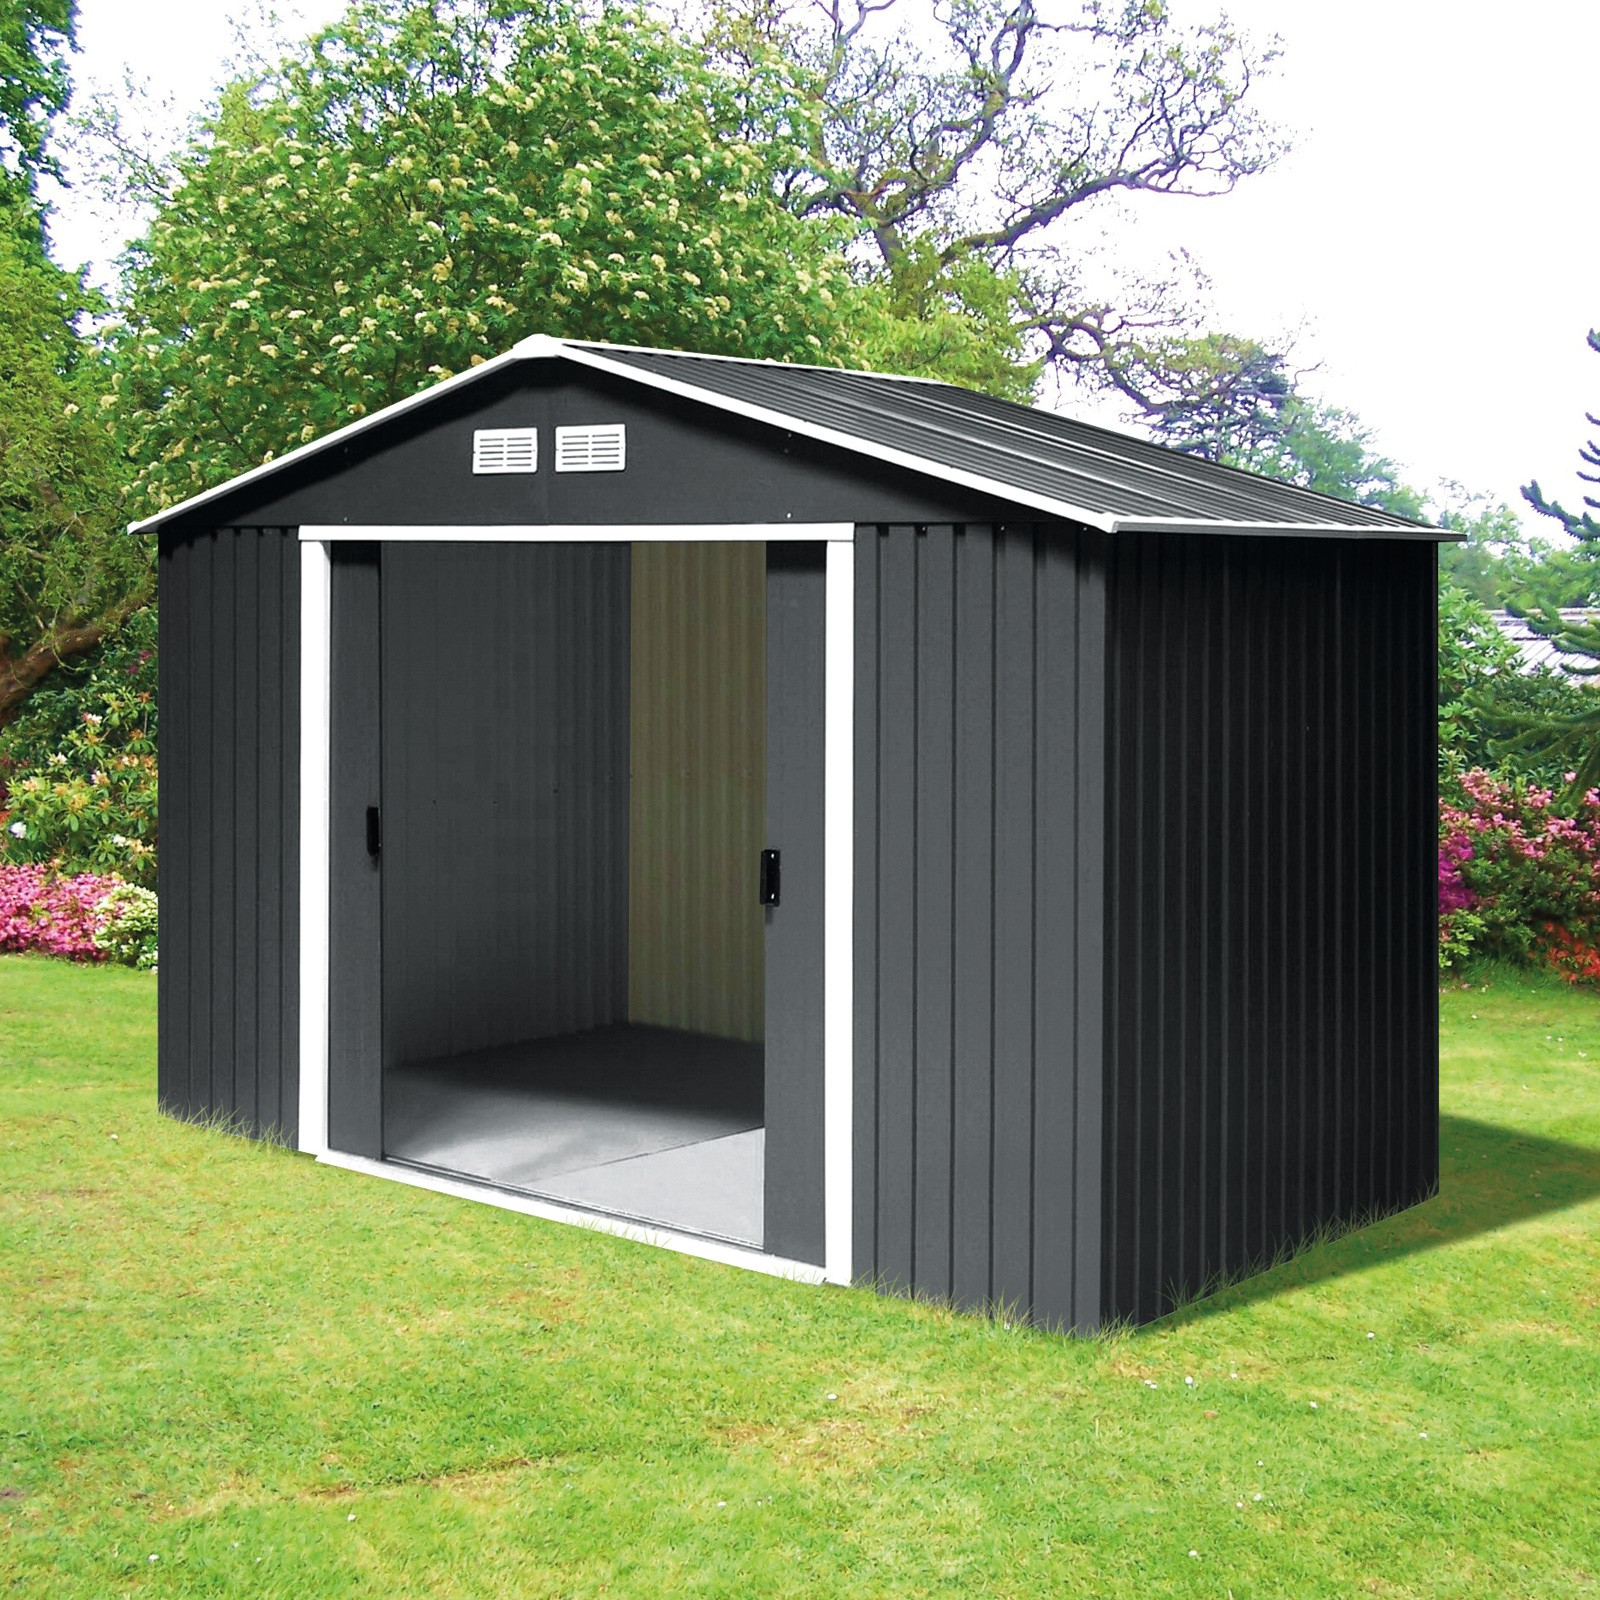 tepro gartenhaus metall ger tehaus titan 8 x 6 anthrazit. Black Bedroom Furniture Sets. Home Design Ideas